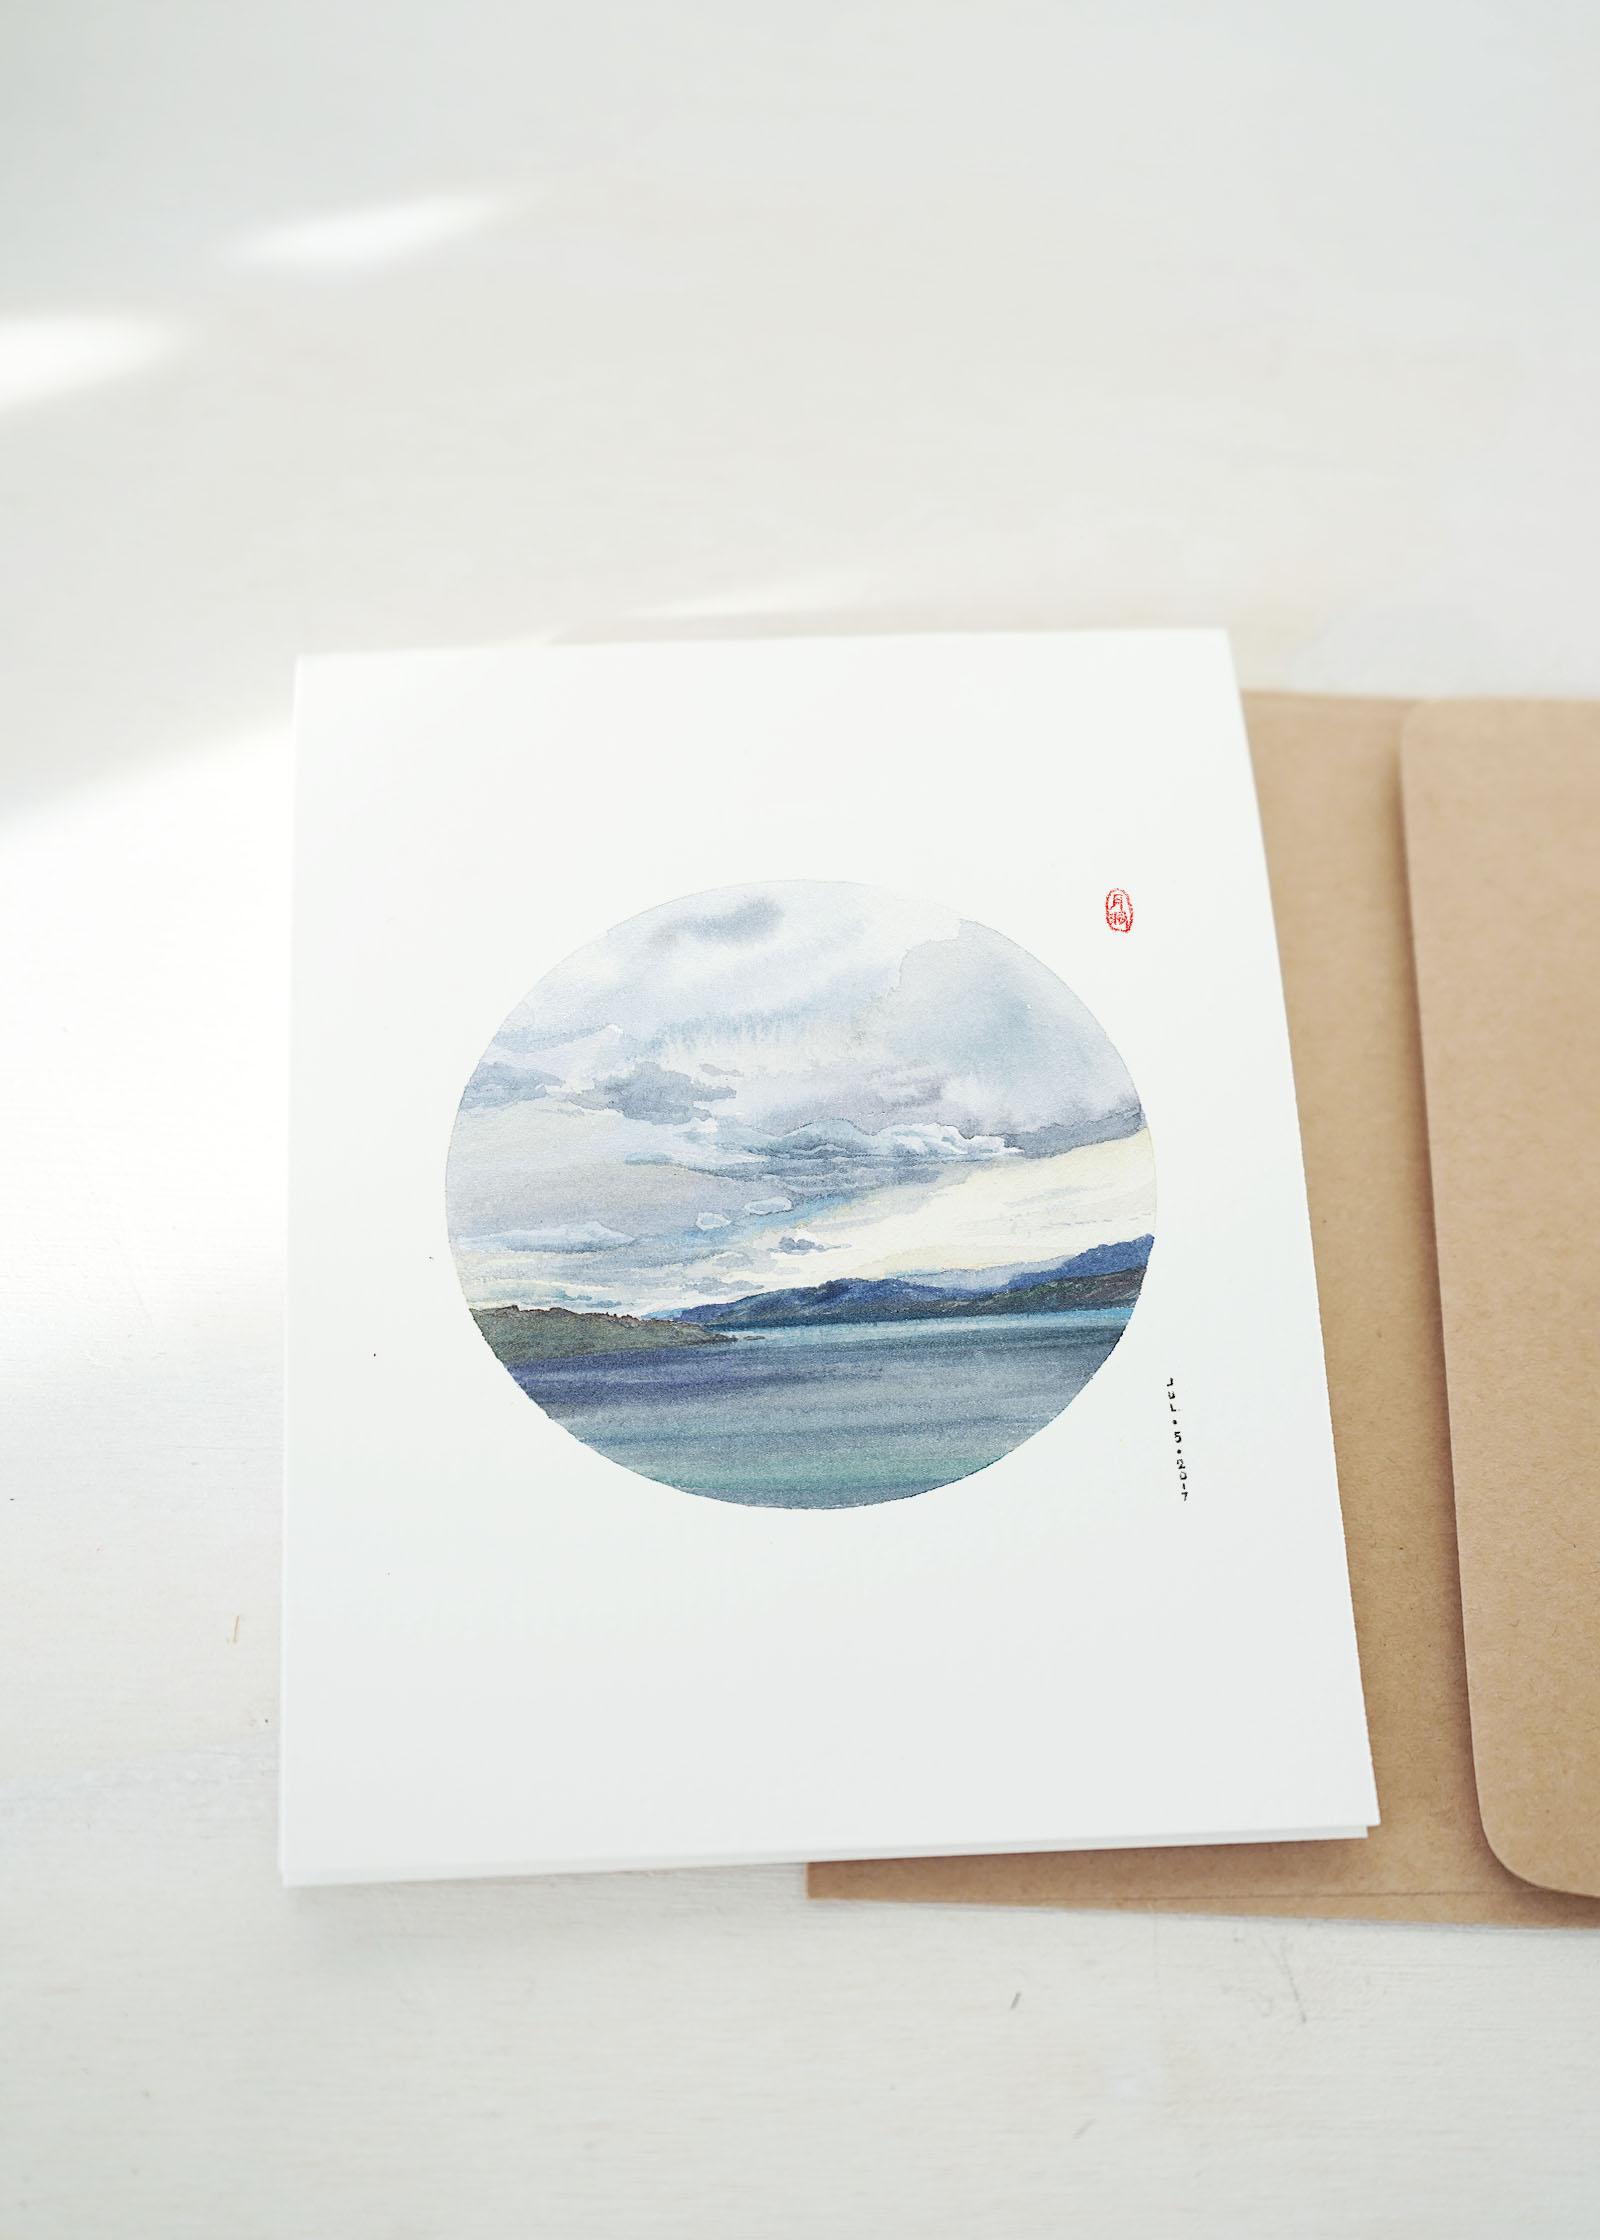 Kalamalka lake watercolor greeting card by WANRU KEMP 4249s.jpg